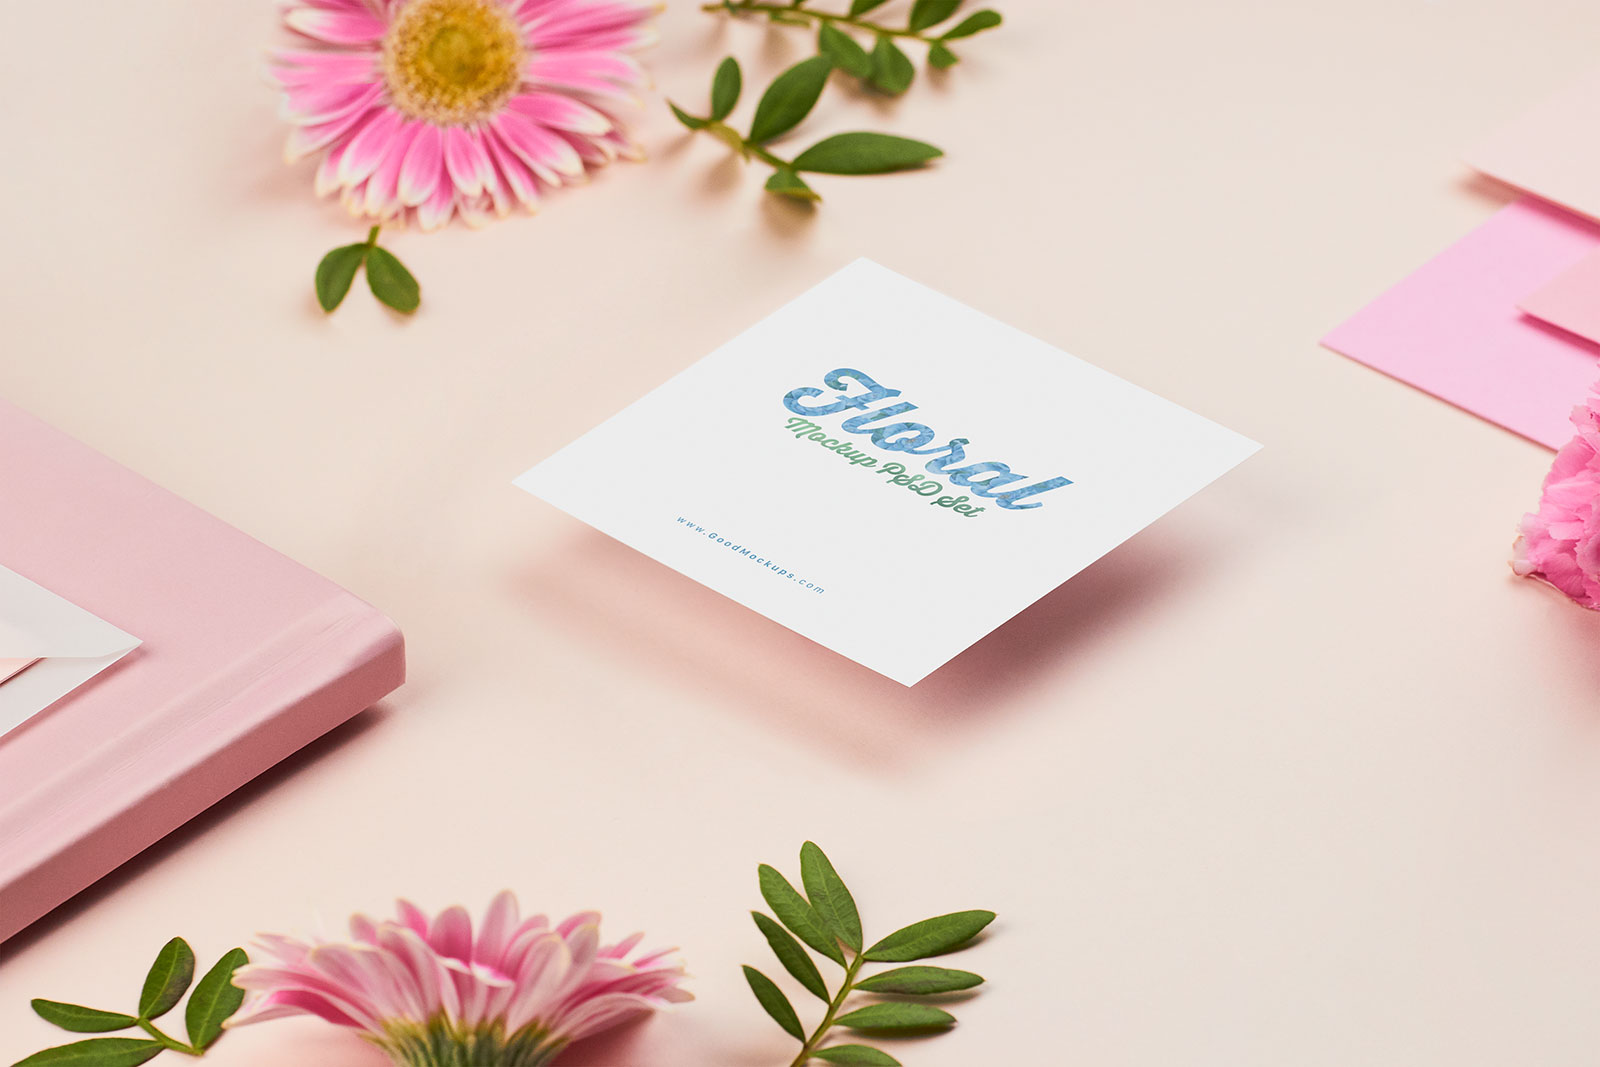 Free Square Greeting / Wedding Card Mockup PSD Set